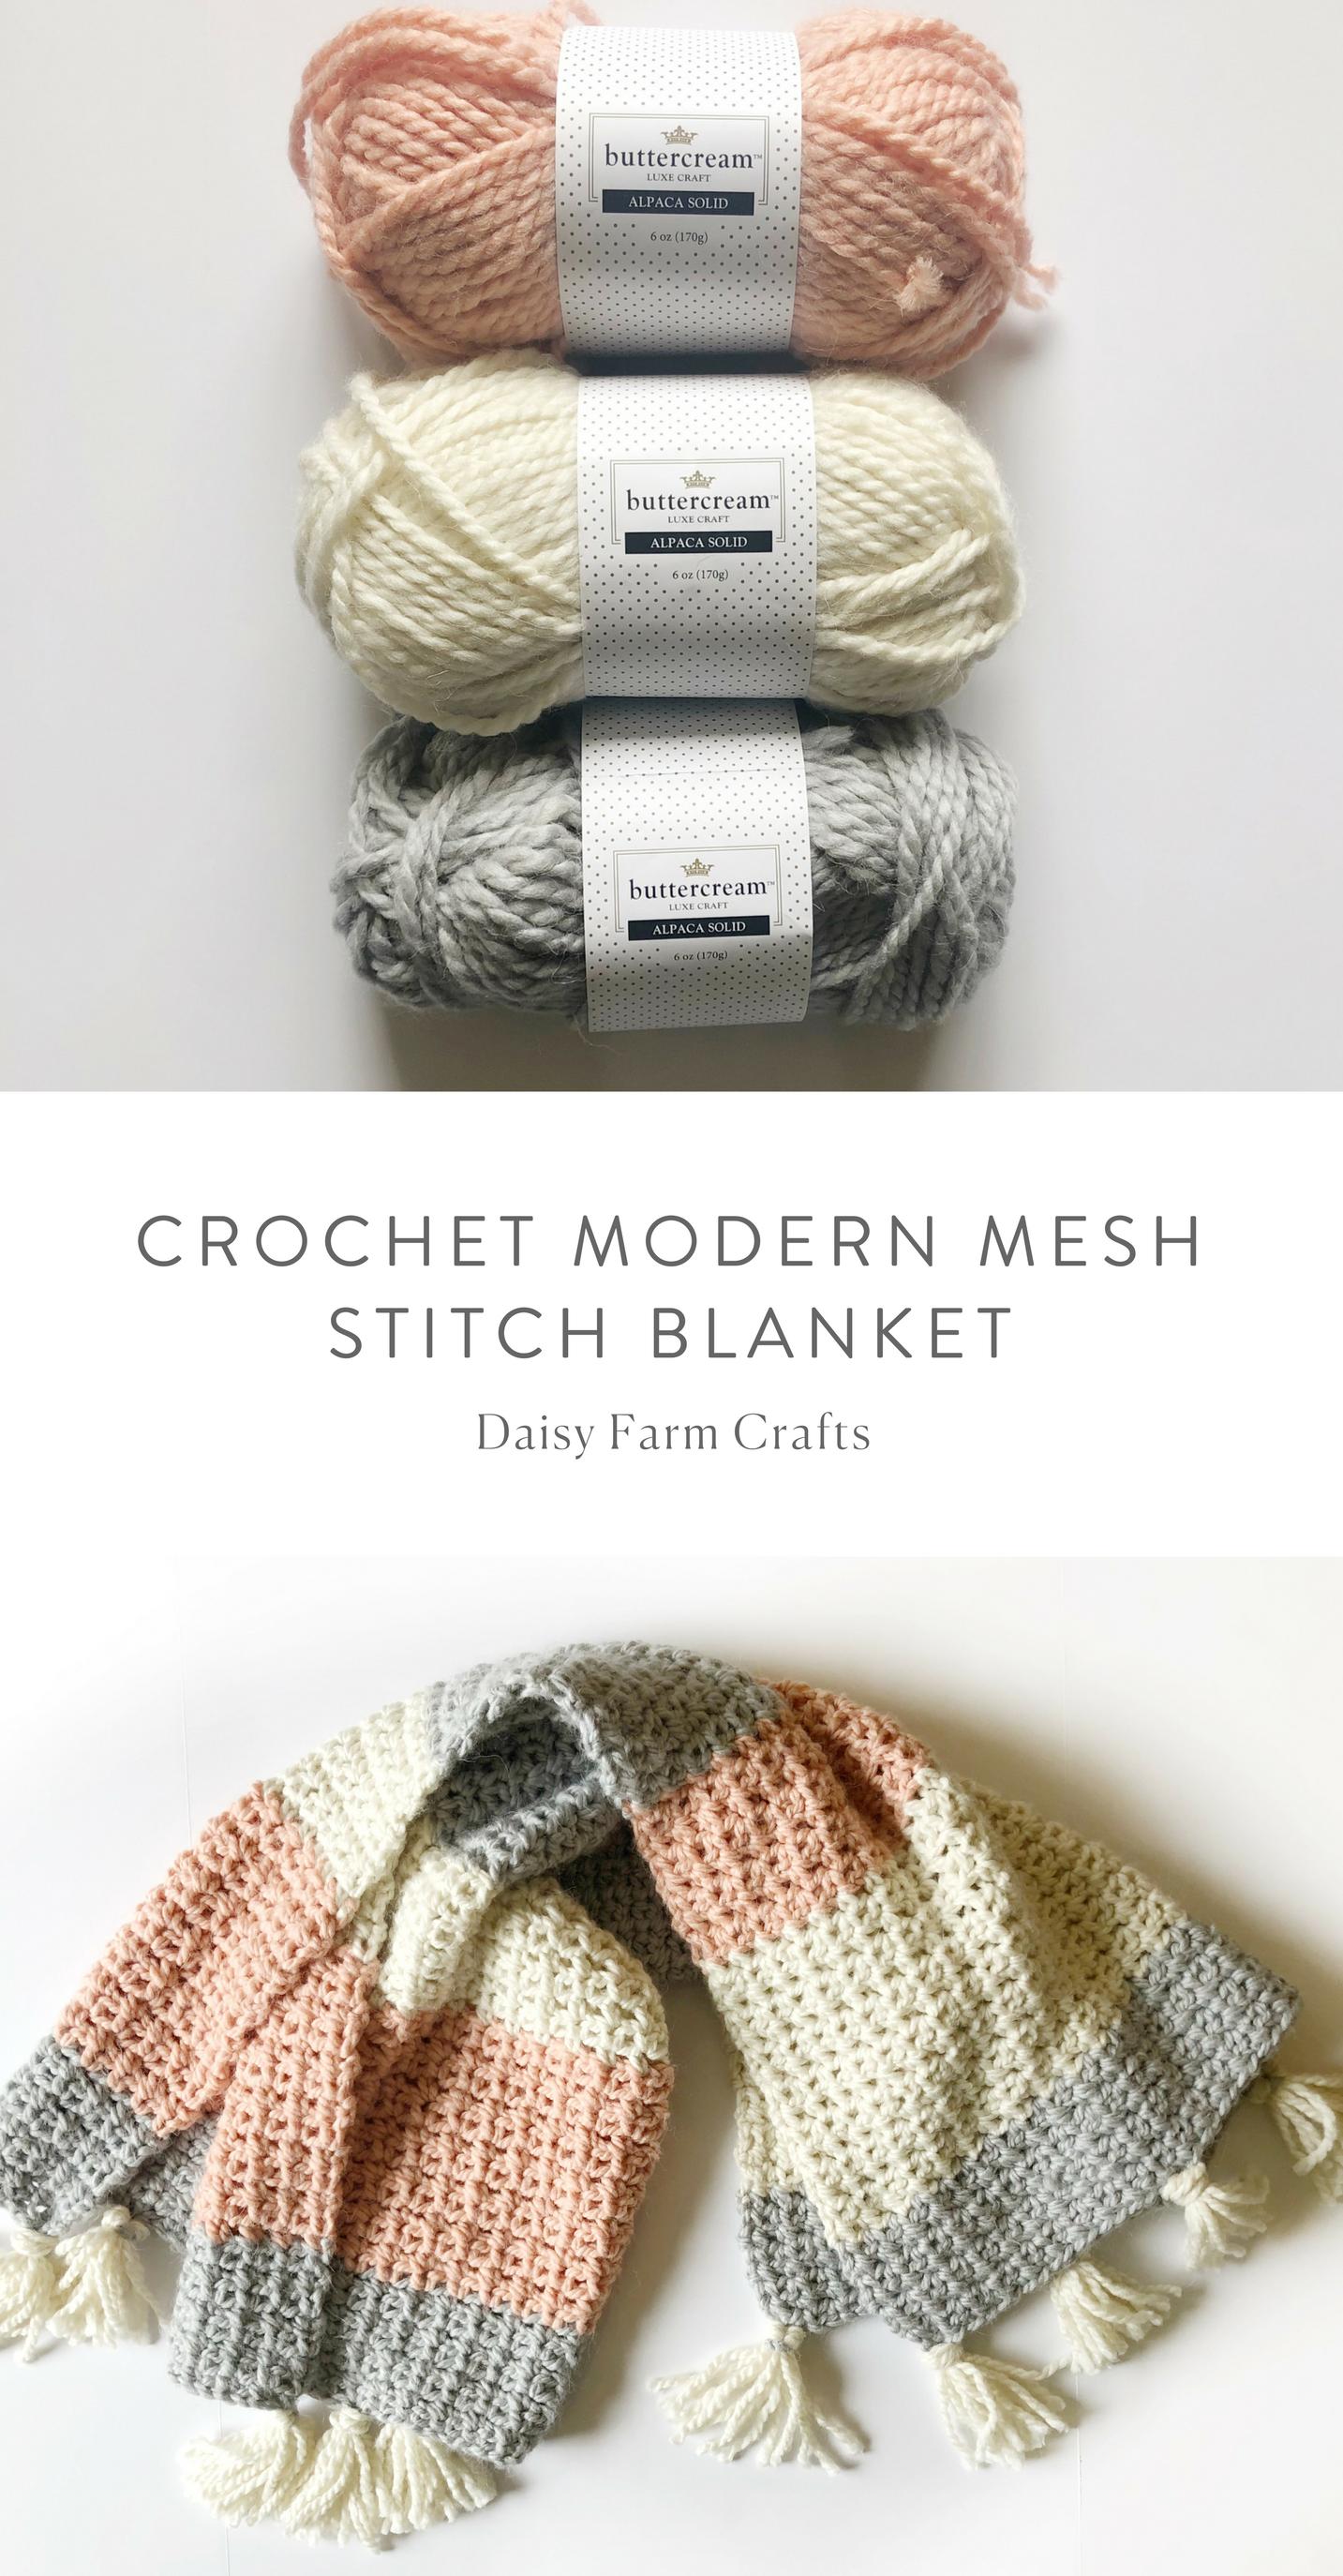 Free Pattern - Crochet Modern Mesh Stitch Blanket #crochet ...